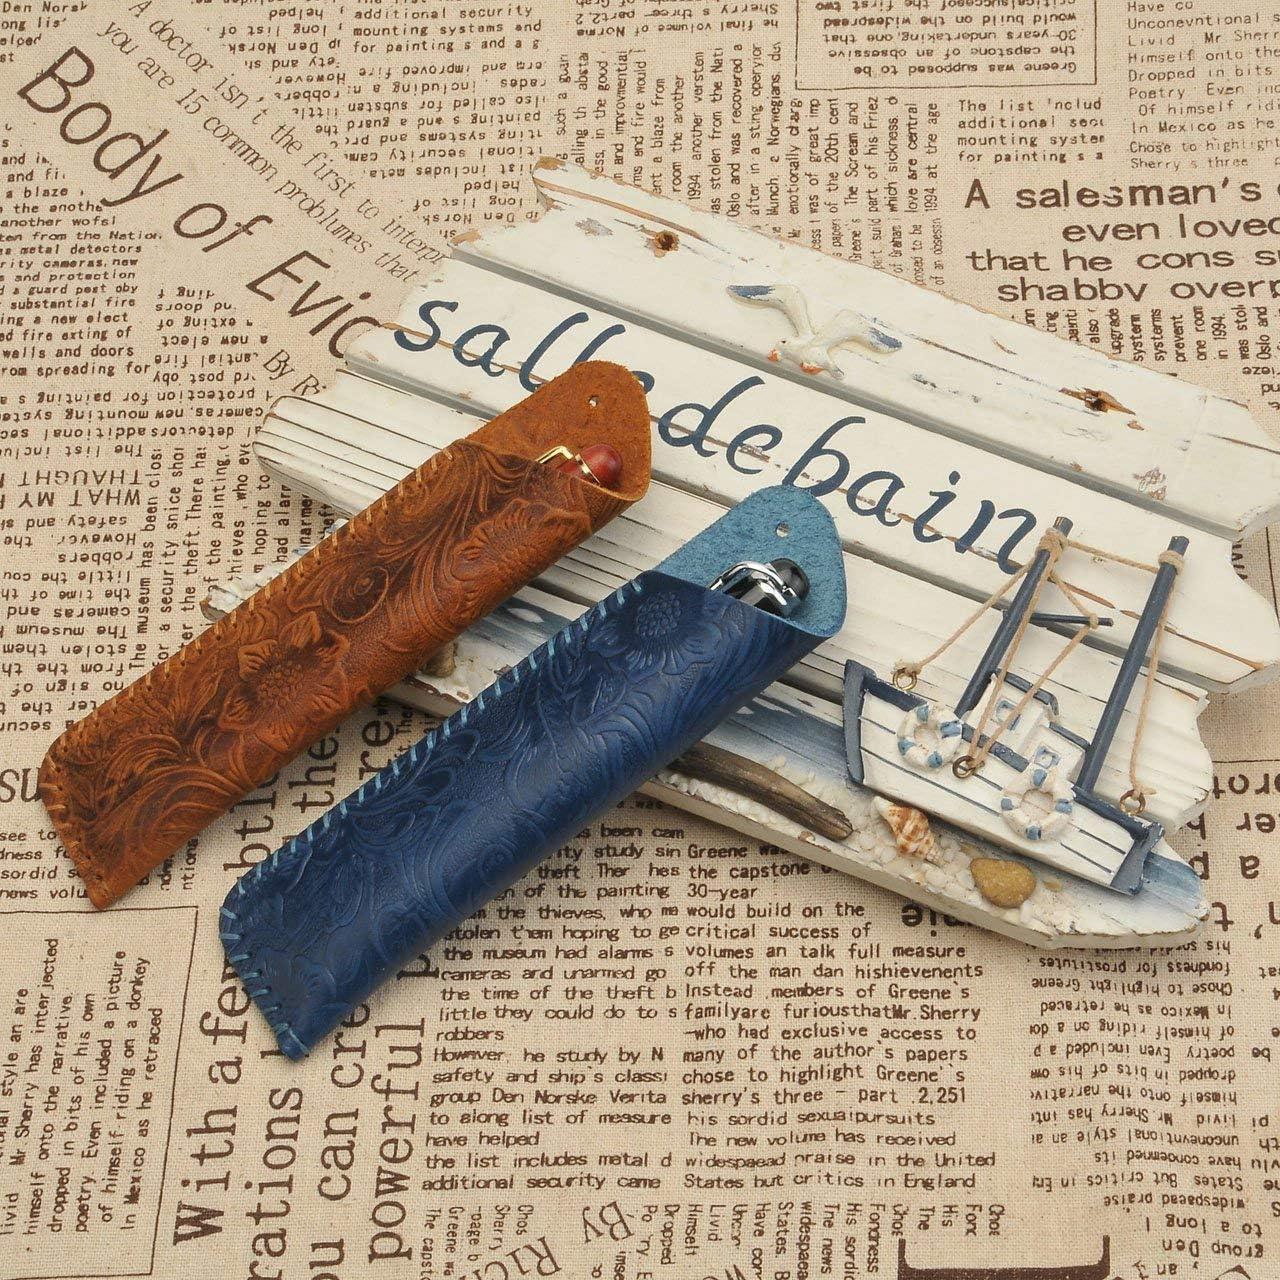 Mogokoyo /Étui en cuir v/éritable emboss/é pour deux stylos  bleu